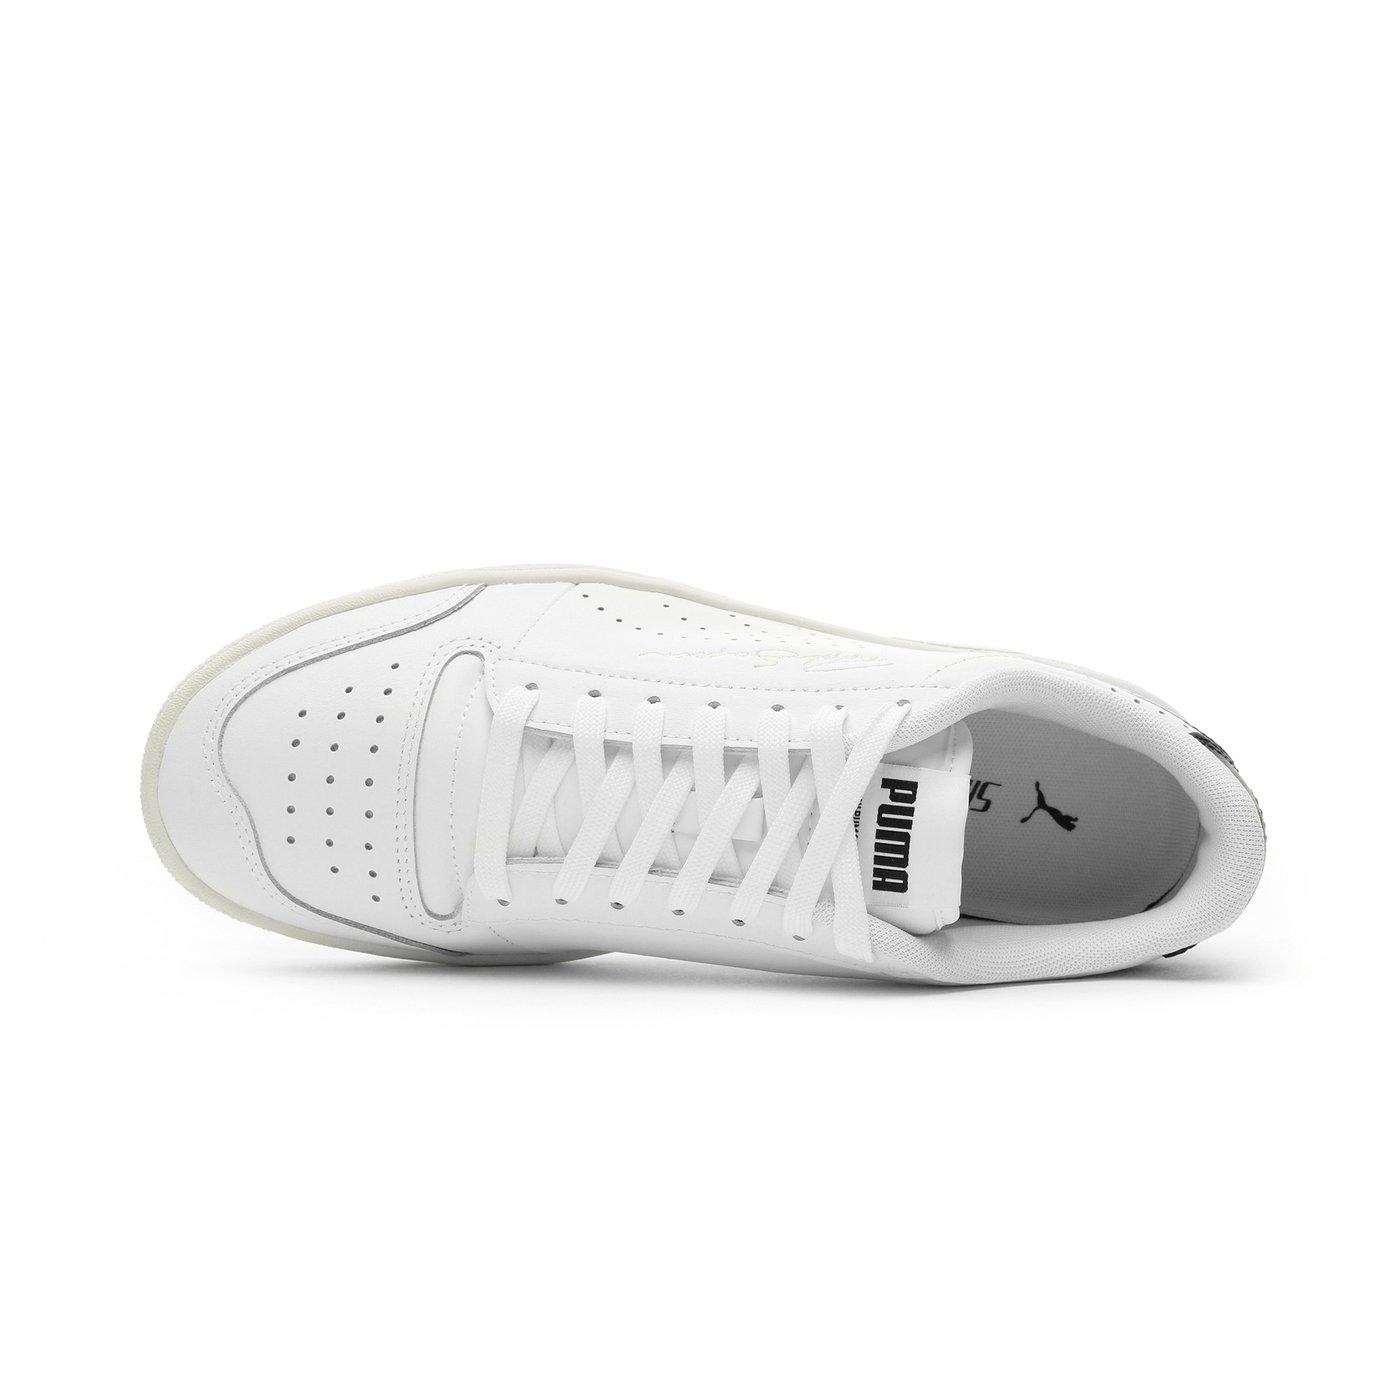 Puma Ralph Sampson Lo Perf Soft Erkek Gri Spor Ayakkabı